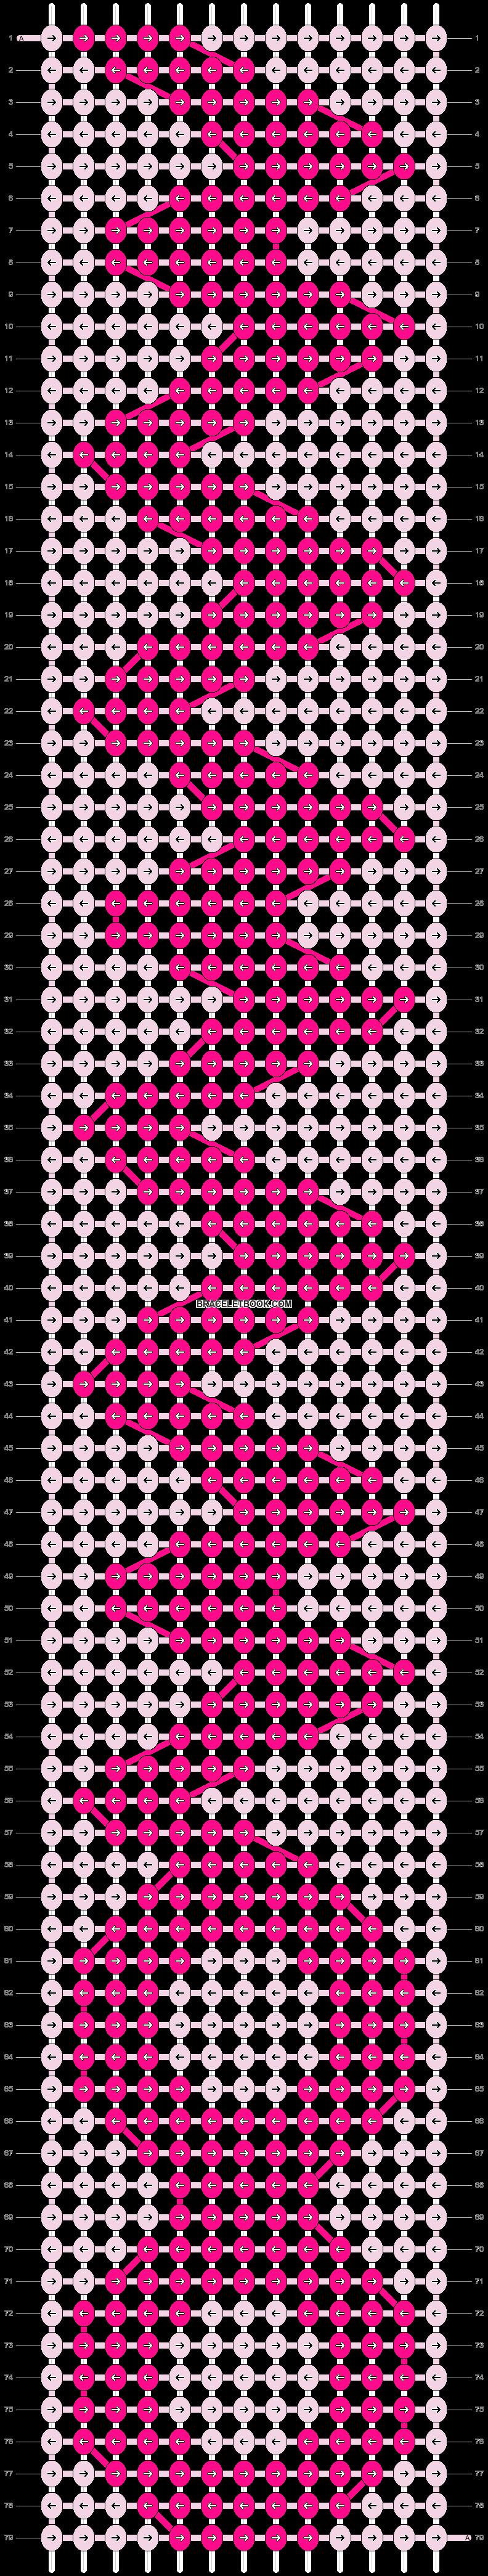 Alpha pattern #52256 pattern